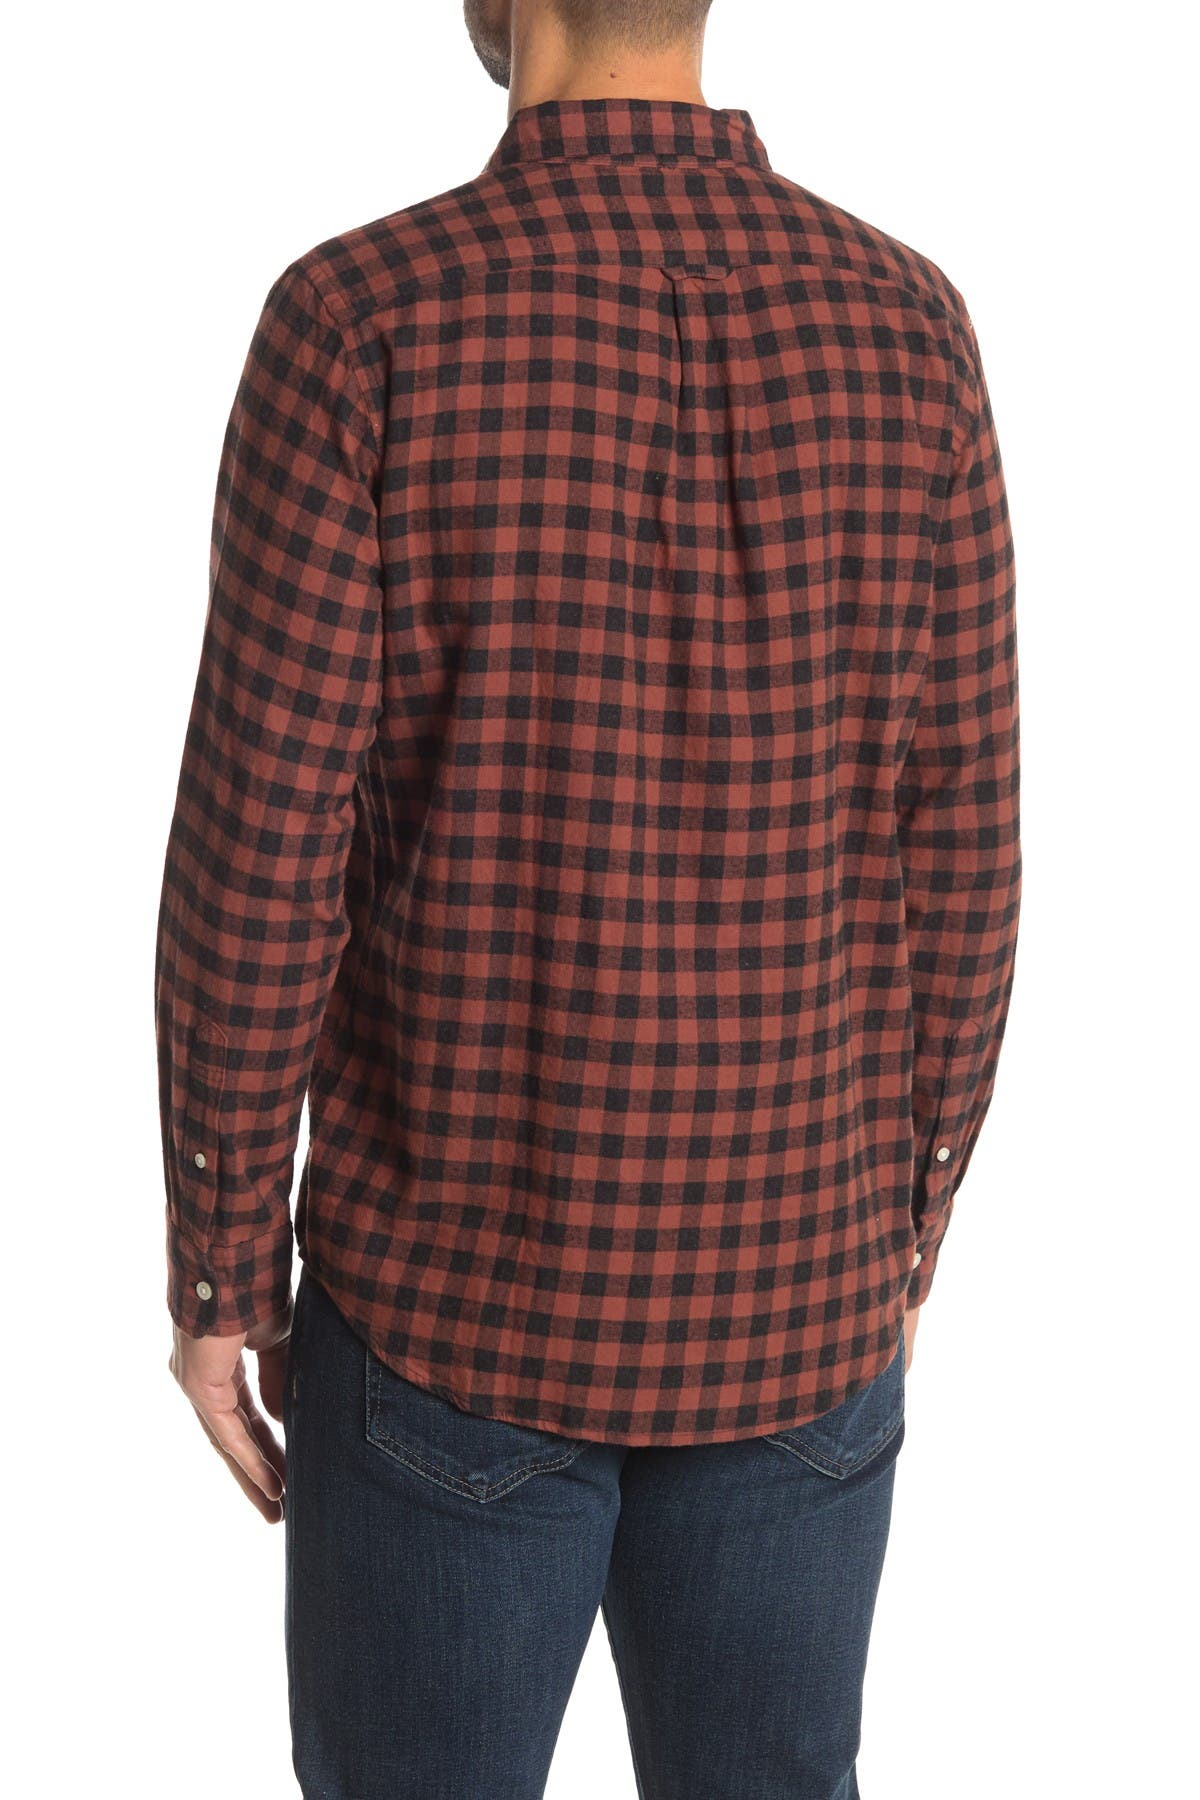 Image of Joe Fresh Gingham Print Medium Weight Flannel Shirt